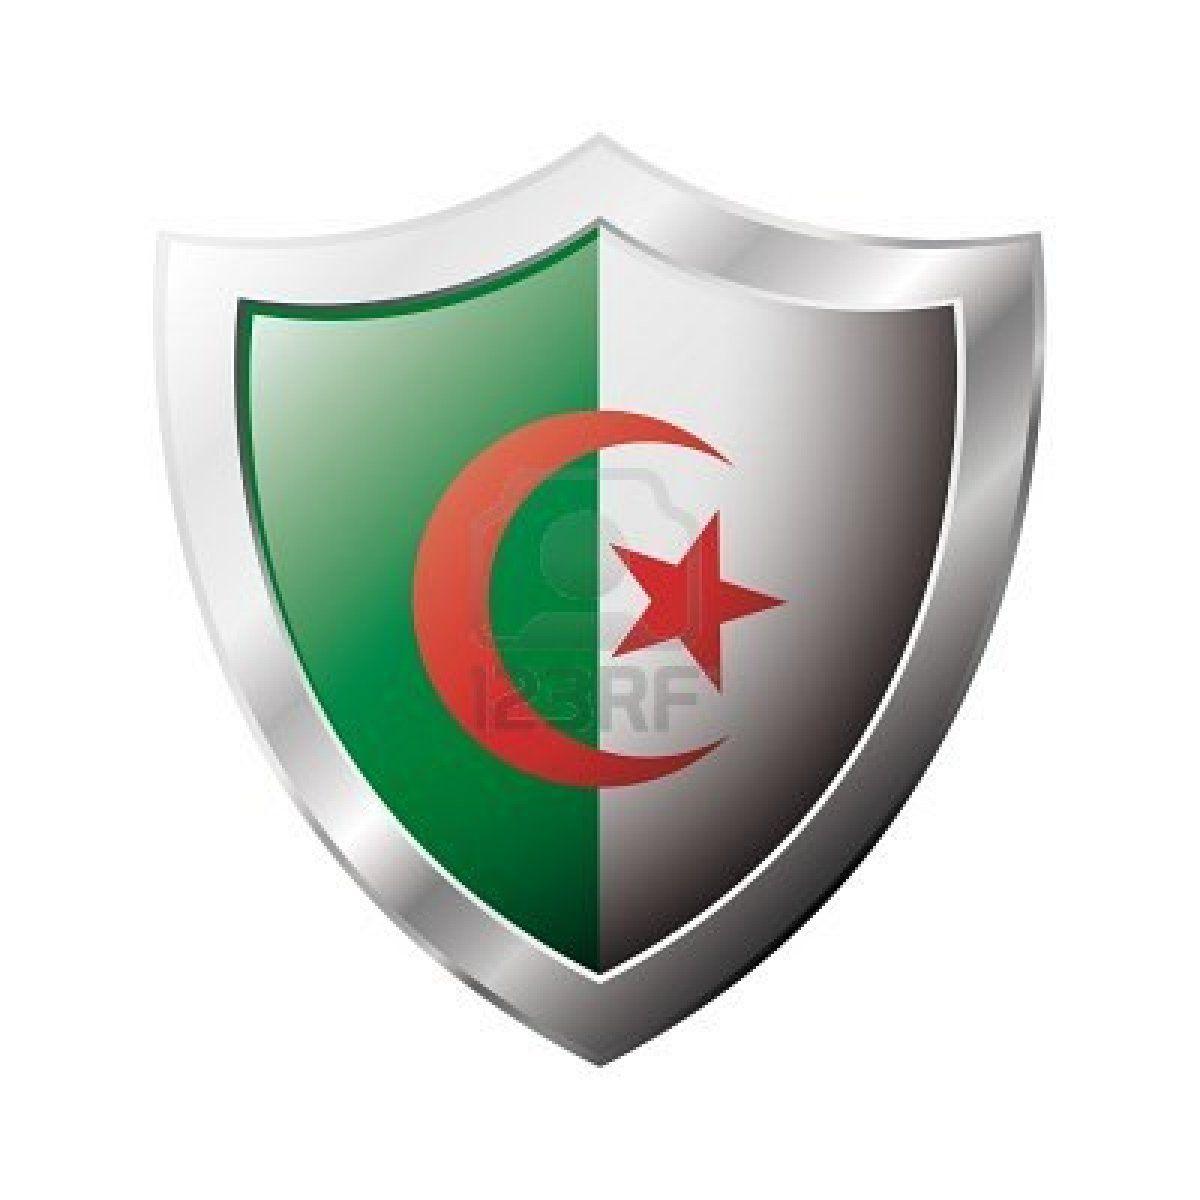 علم الجزائر يرفرف Yahoo Image Search Results Houston Astros Logo Astros Logo Team Logo